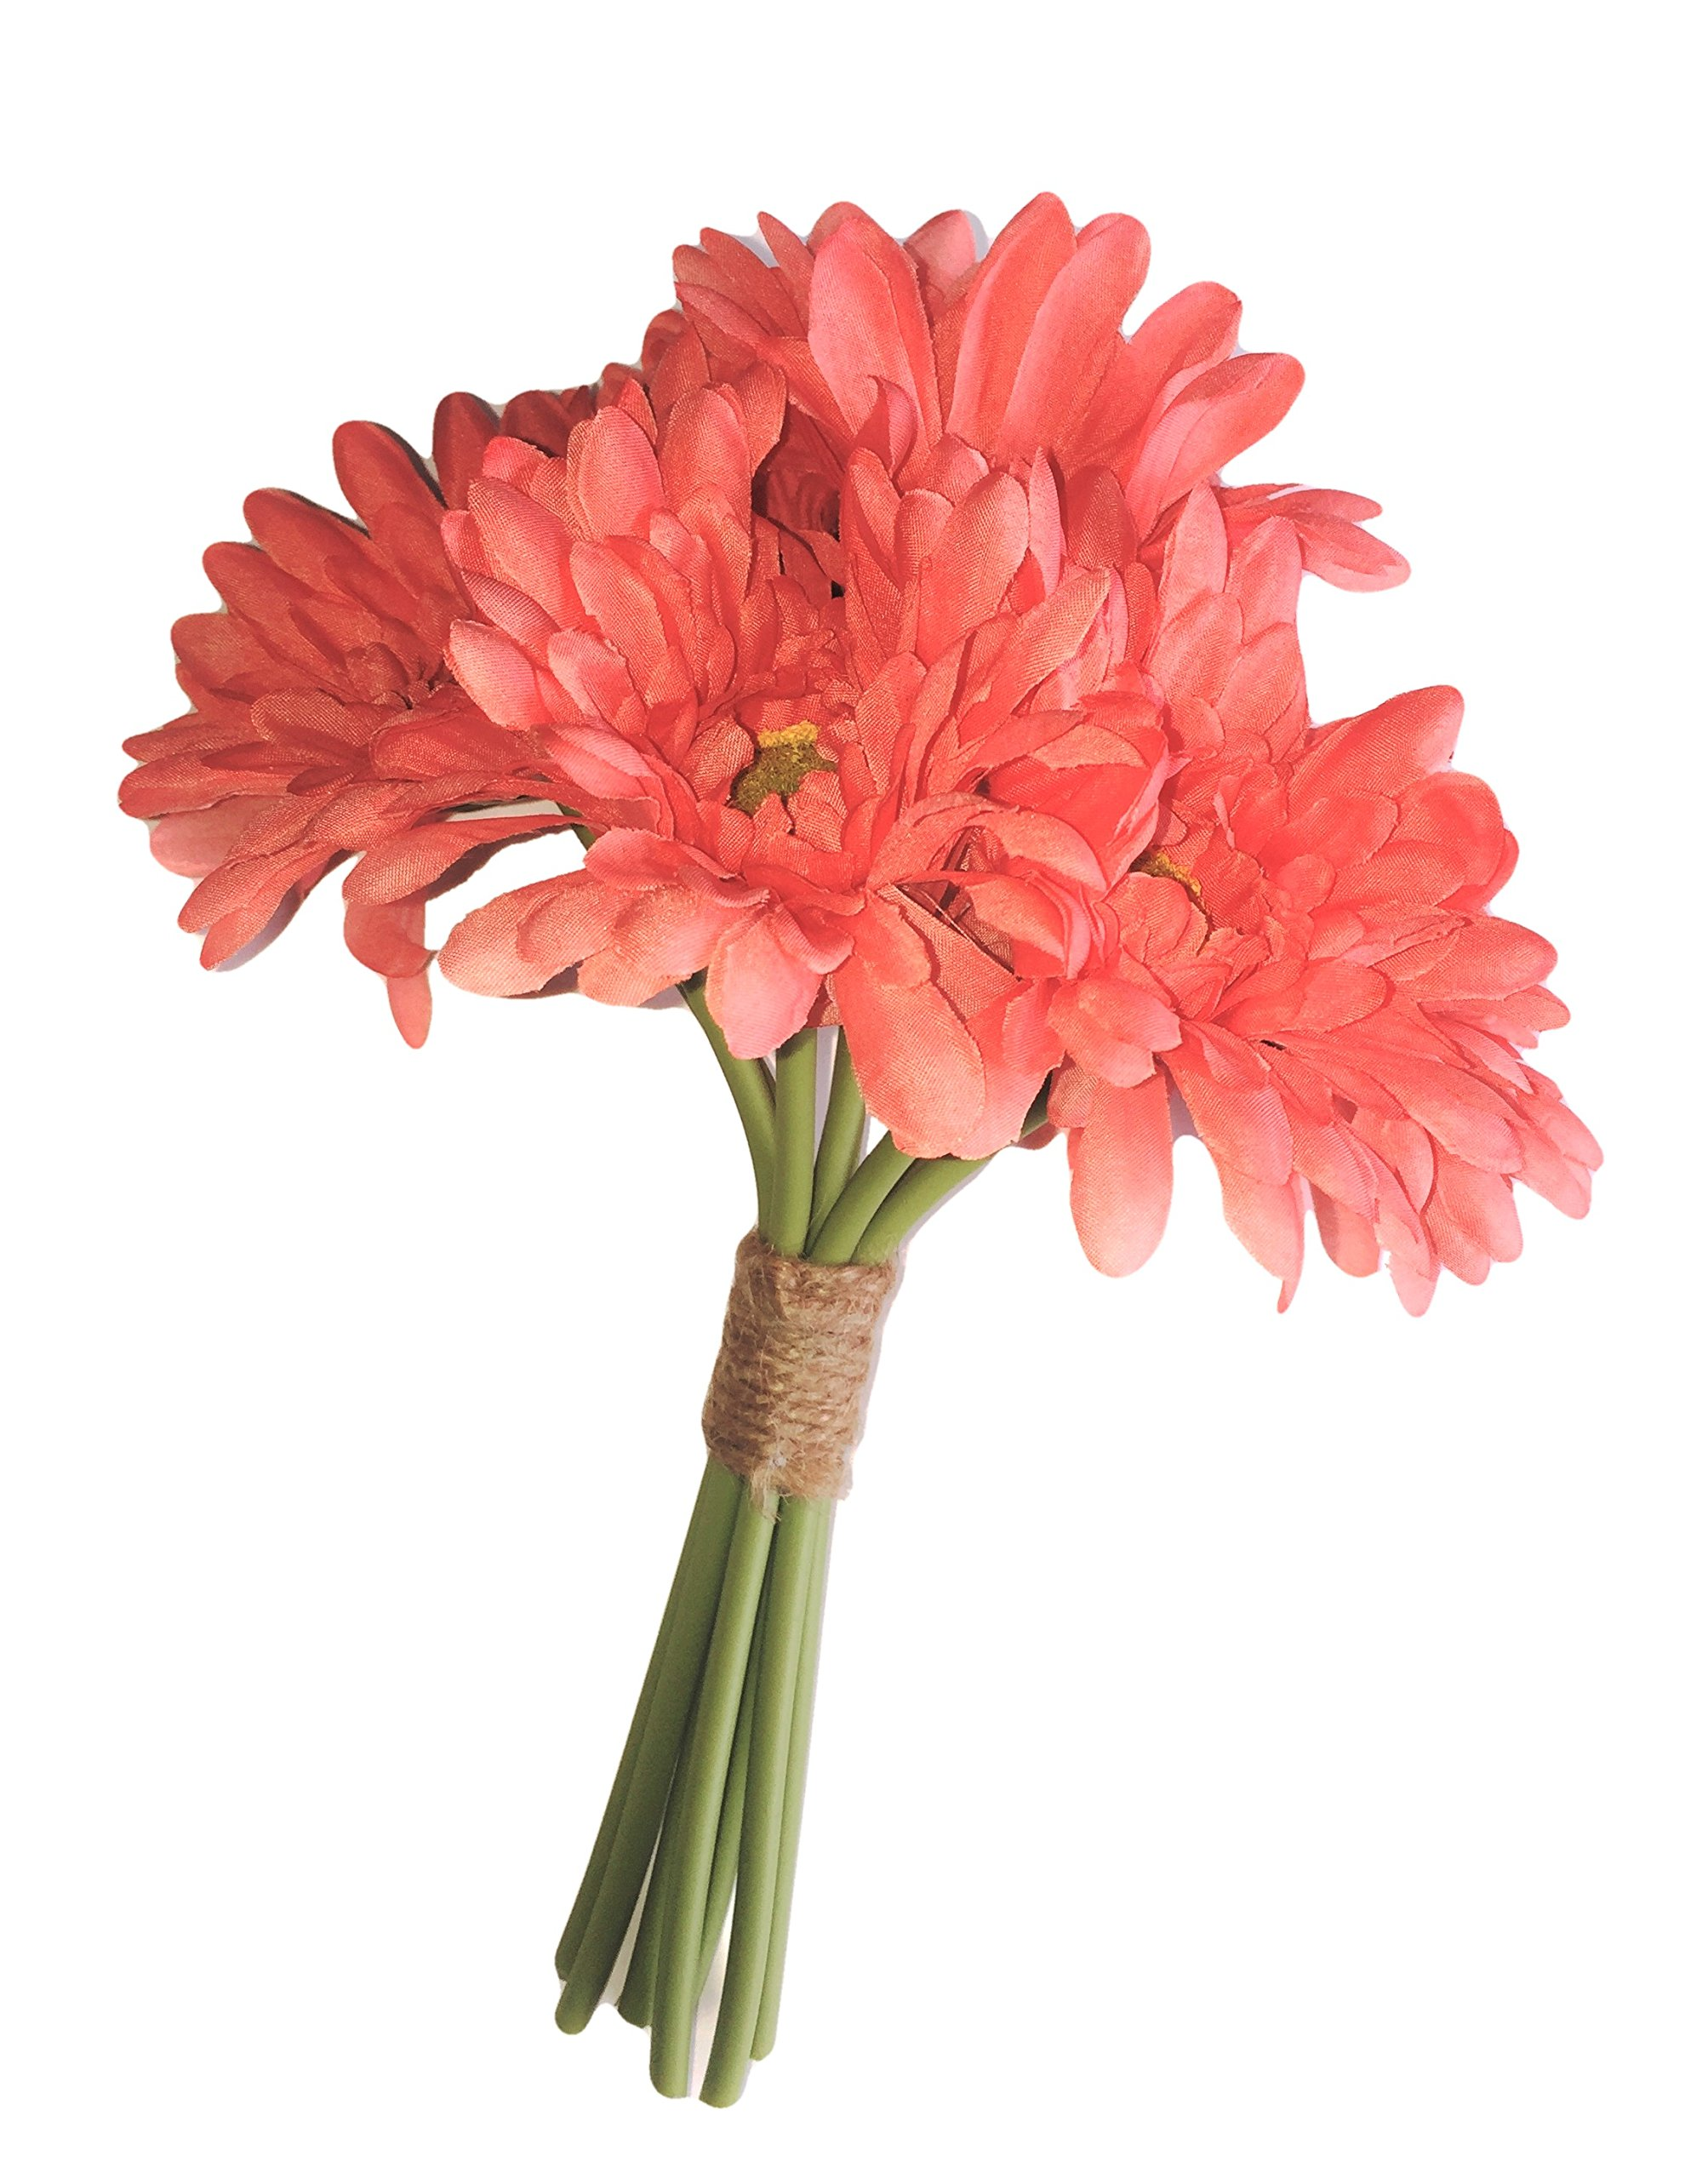 Elegance-Blooms-Things-Silk-Coral-Gerbera-Daisy-Bouquet-Bunch-Nosegay-Bride-Bridesmaid-Floral-Wedding-Home-Decor-Vase-Tabletop-Arrangements-Gifts-DIY-Flowers-Realistic